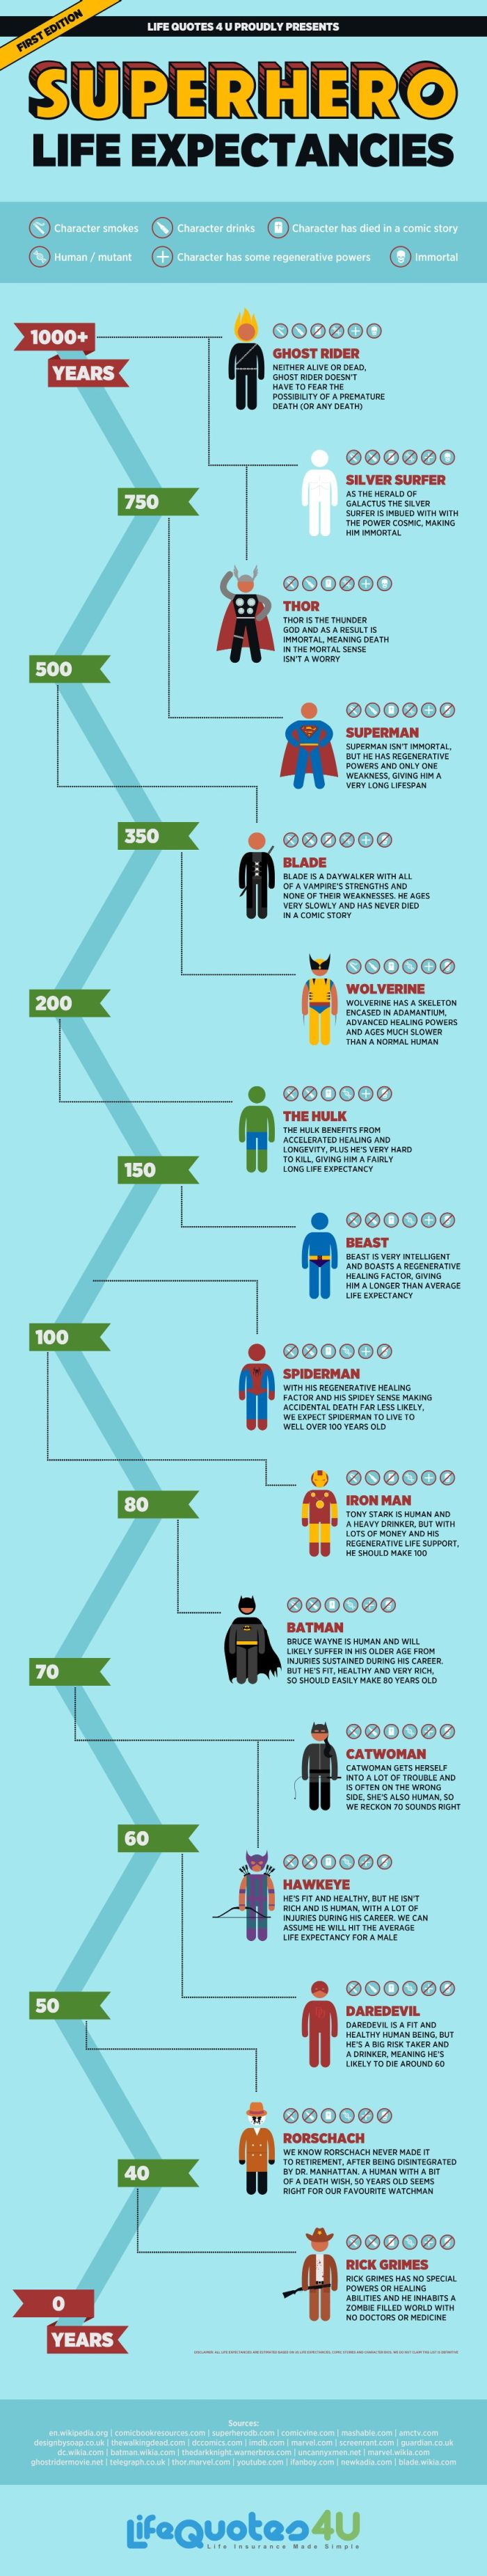 Superhero Life Expectancies (infographic)